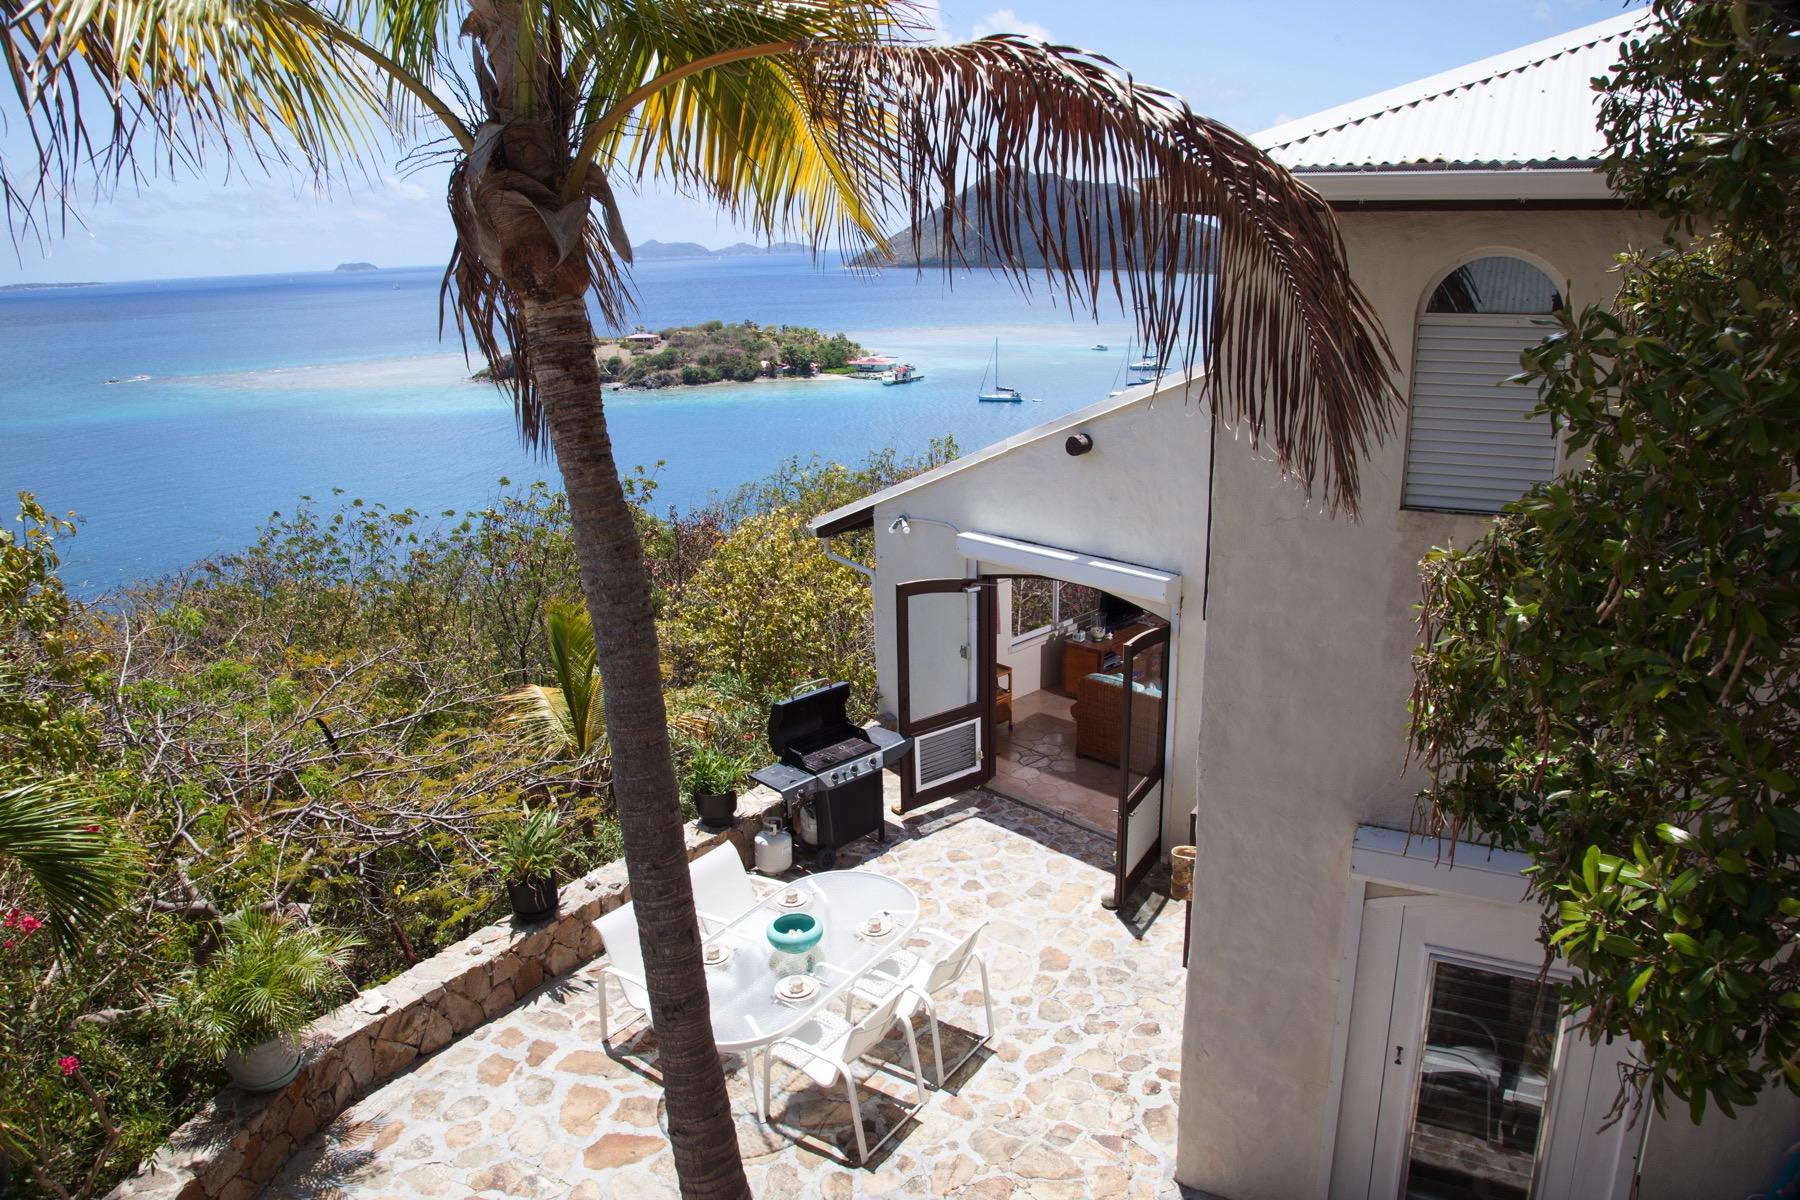 Villa per Vendita alle ore Serendipity - Great Camanoe Privateers Bay, Great Camanoe Isole Vergini Britanniche